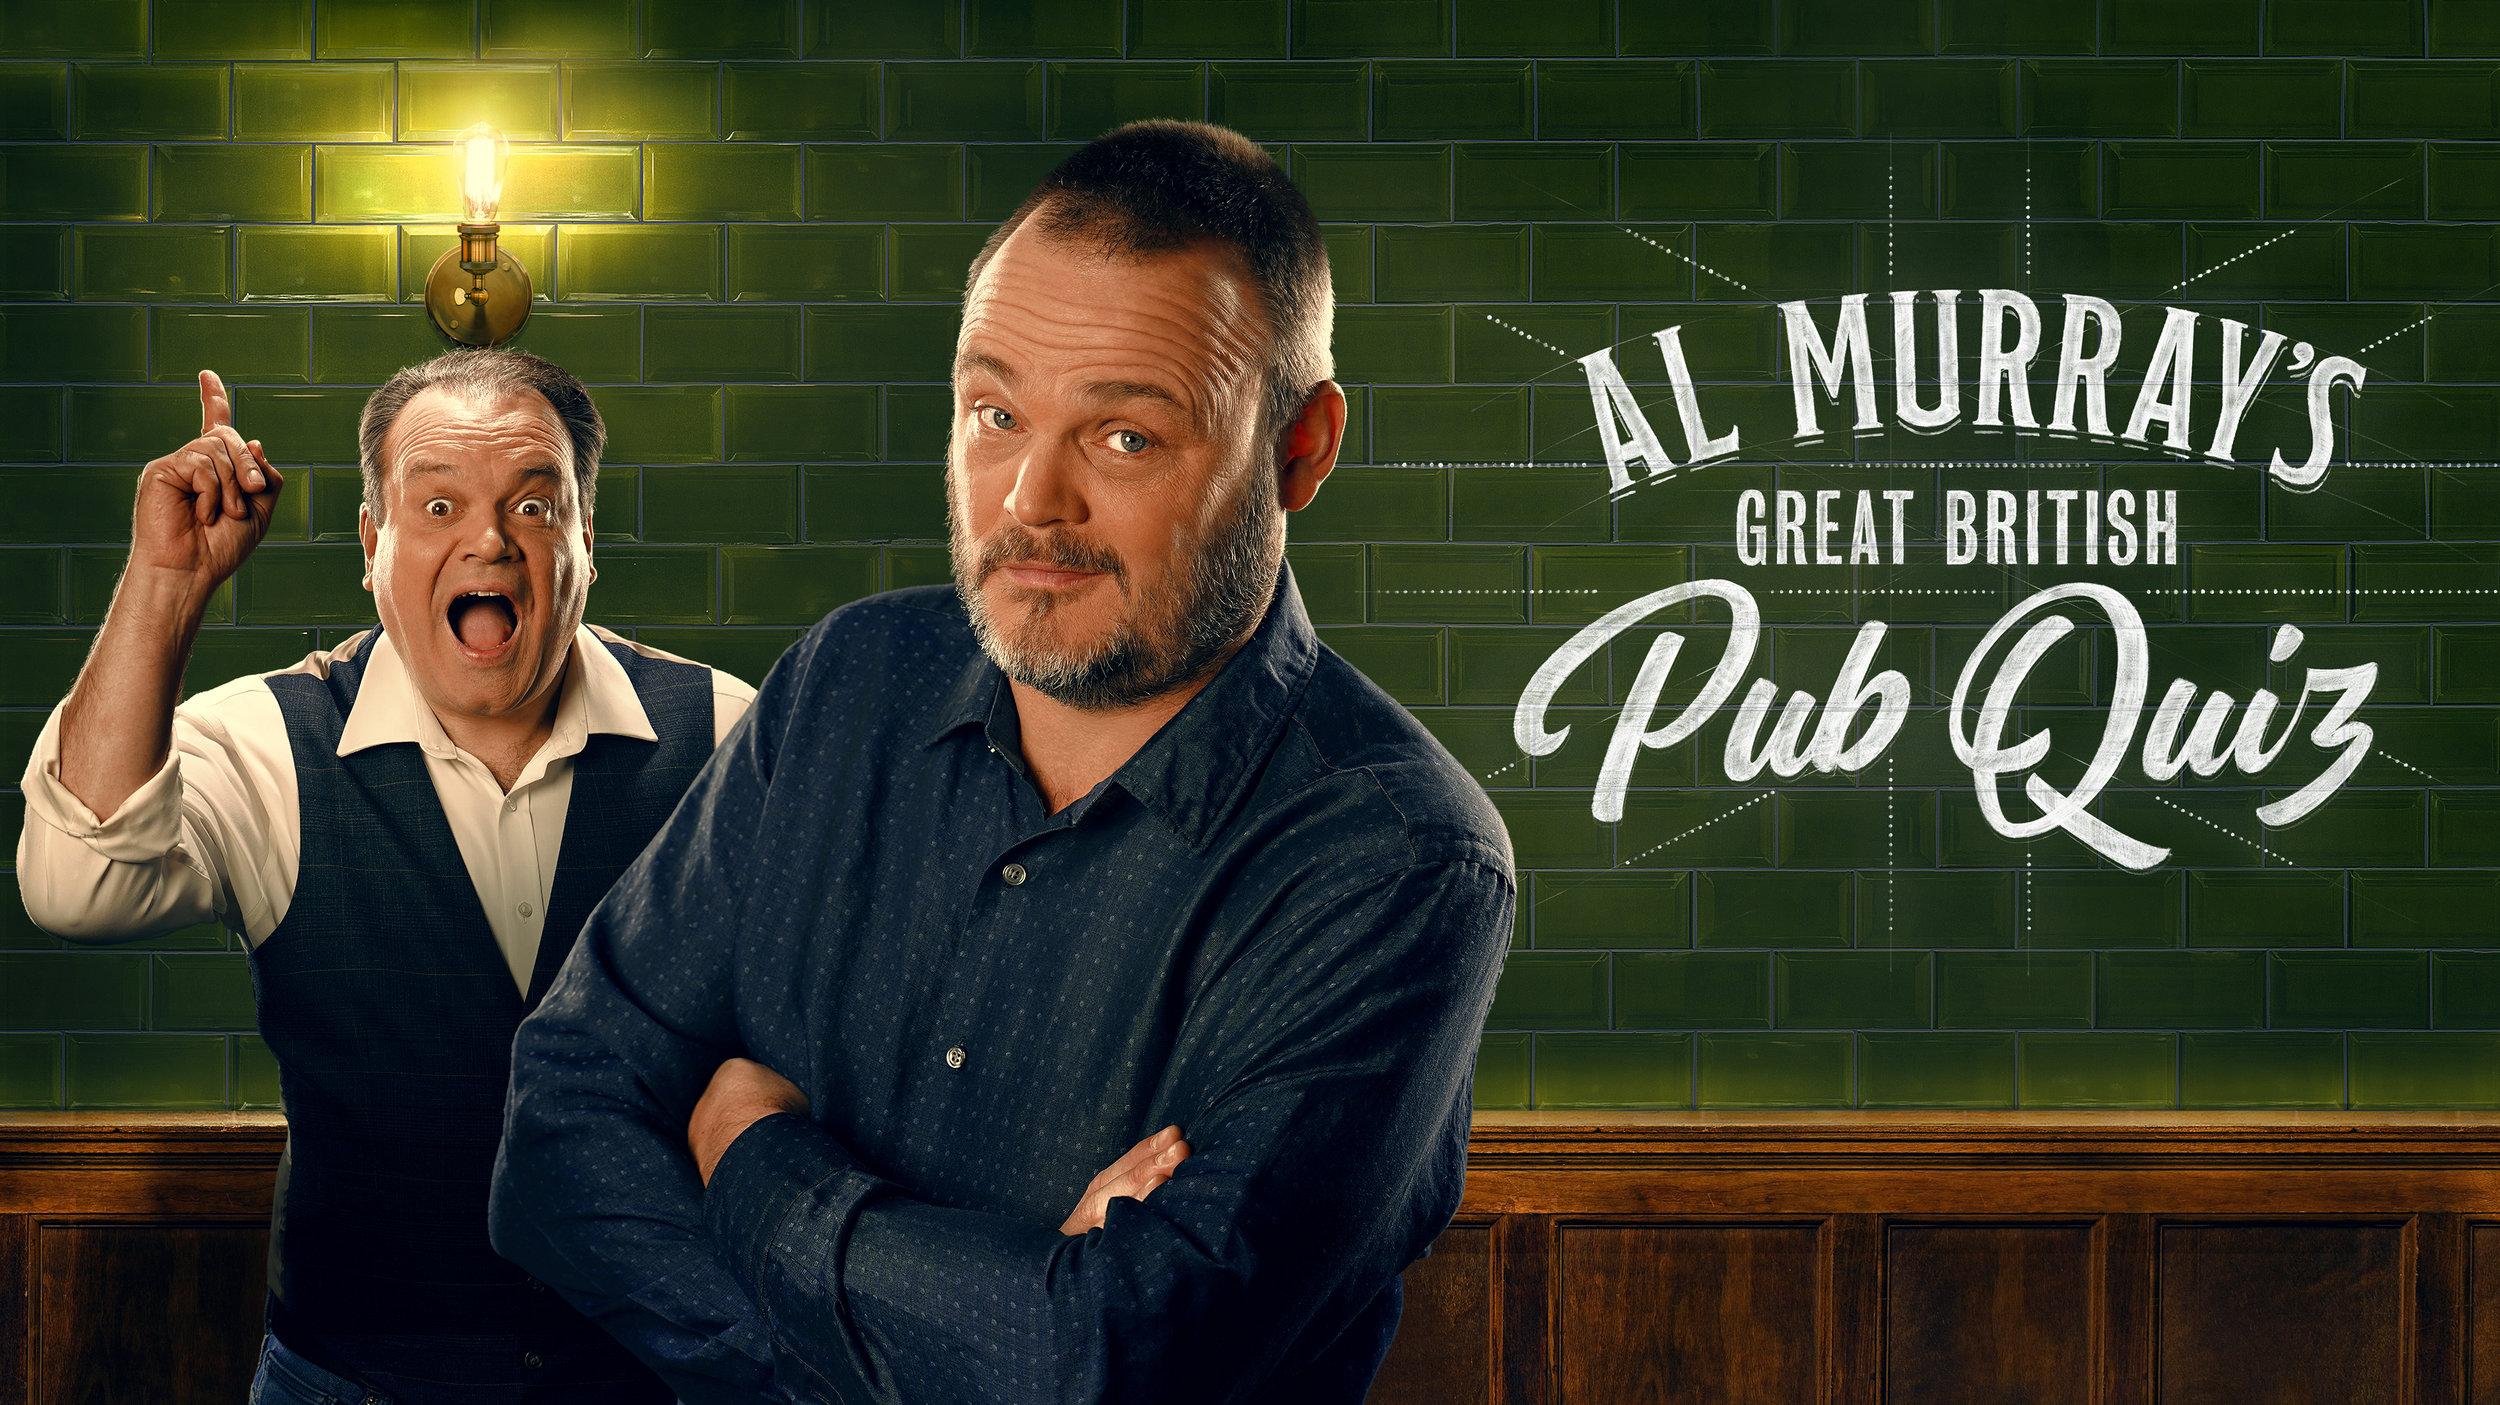 QUUK_Al Murrays Great British Pub Quiz_16x9_WITH_TITLE.jpg